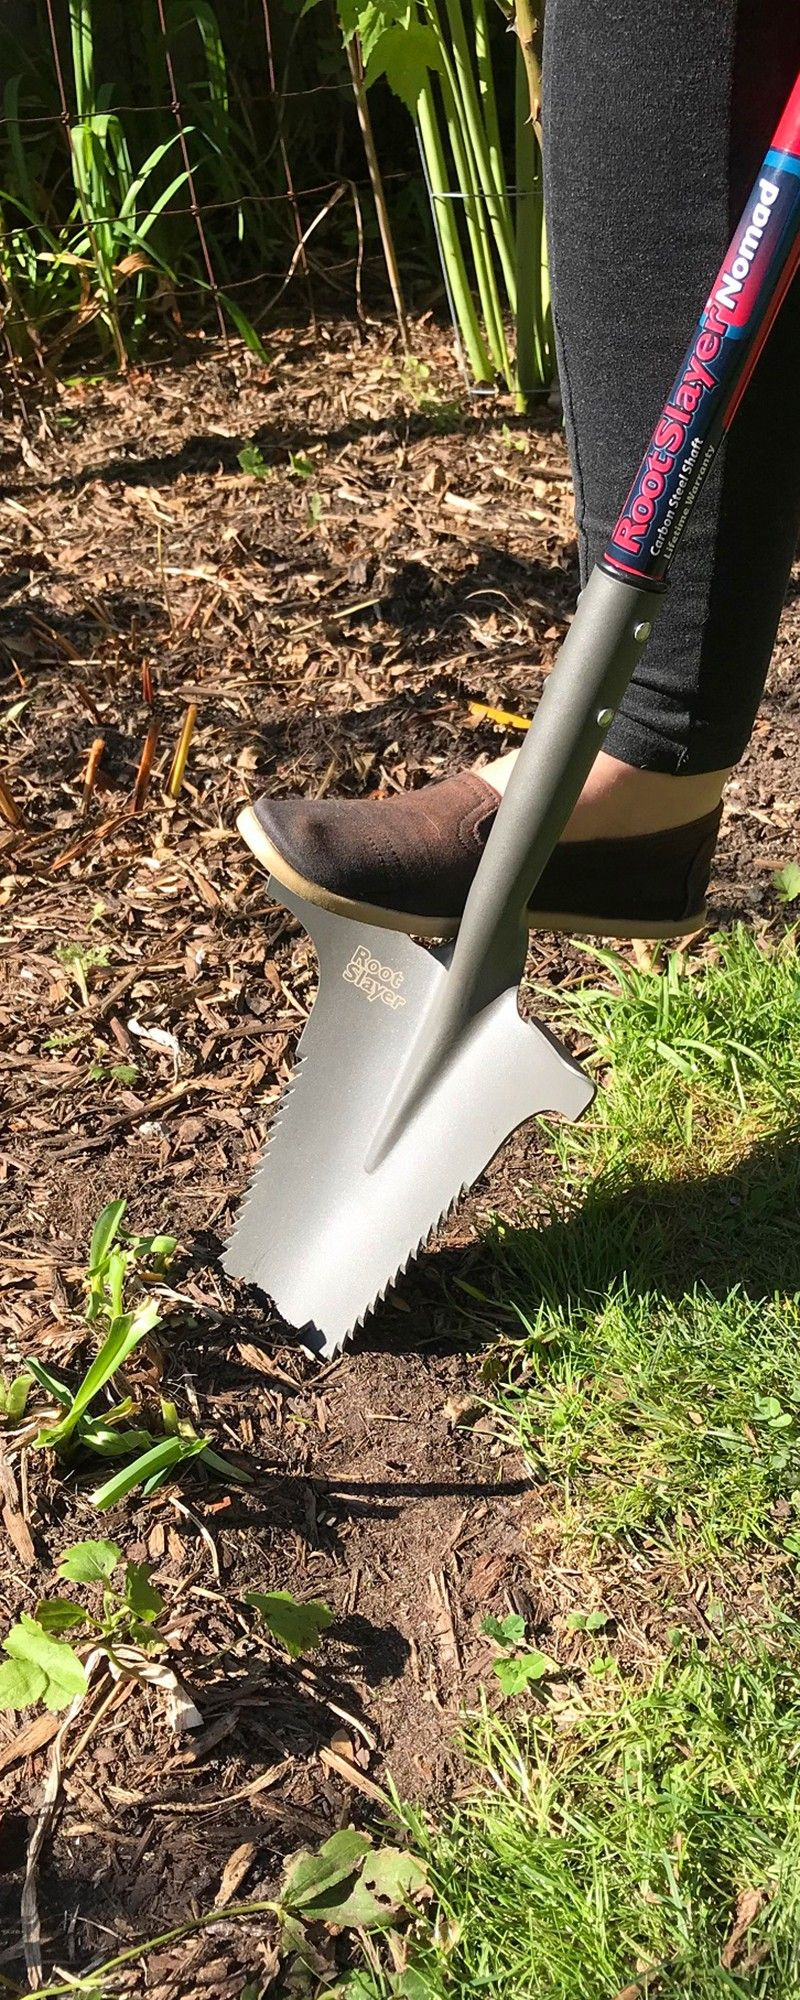 Radius Garden: Root Slayer Carbon Steel Shovel | Pinterest | Gardens ...